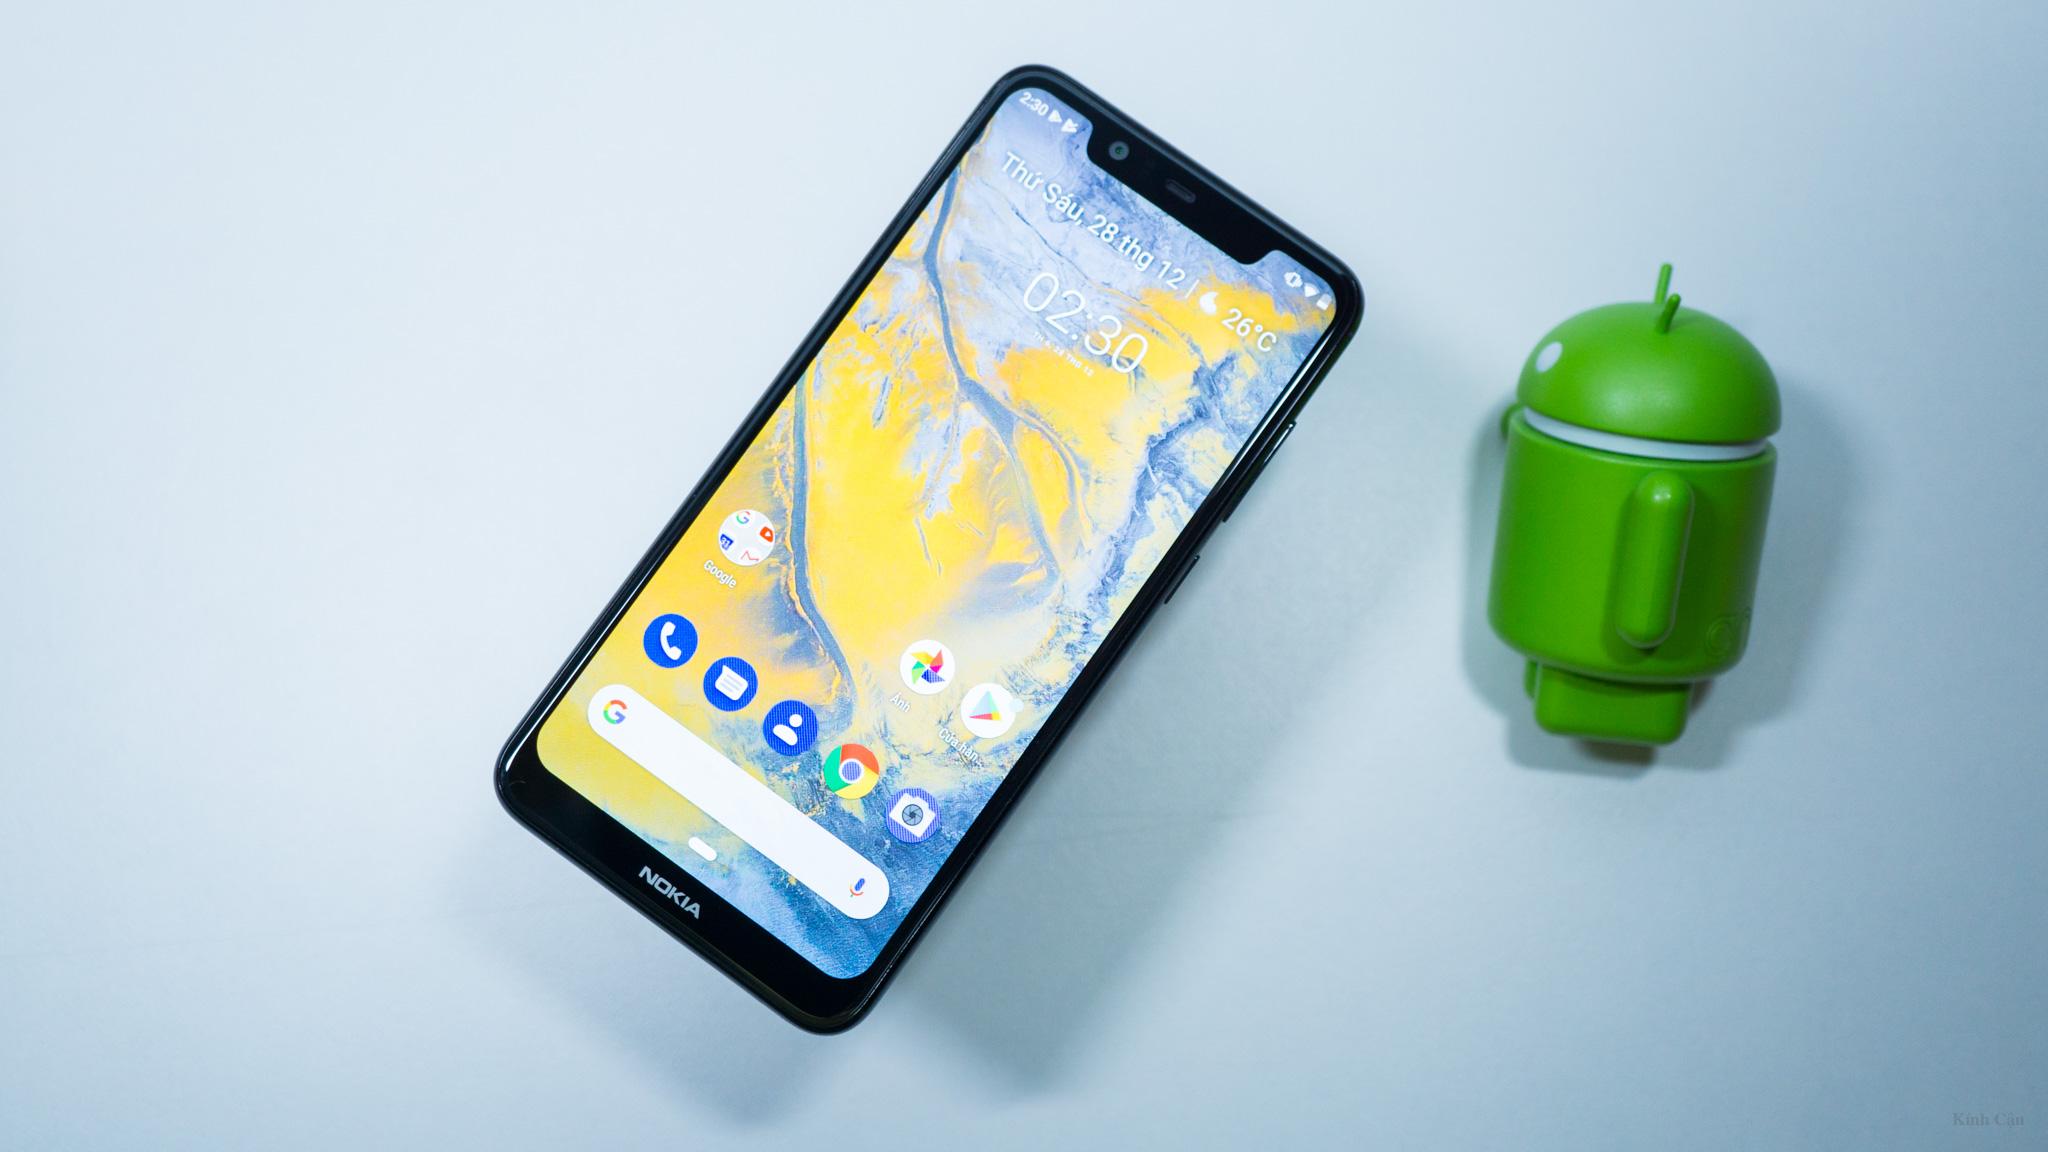 Nokia 5.1 Plus và Nokia 6.1 Plus lên Android 9 Pie_-8.jpg